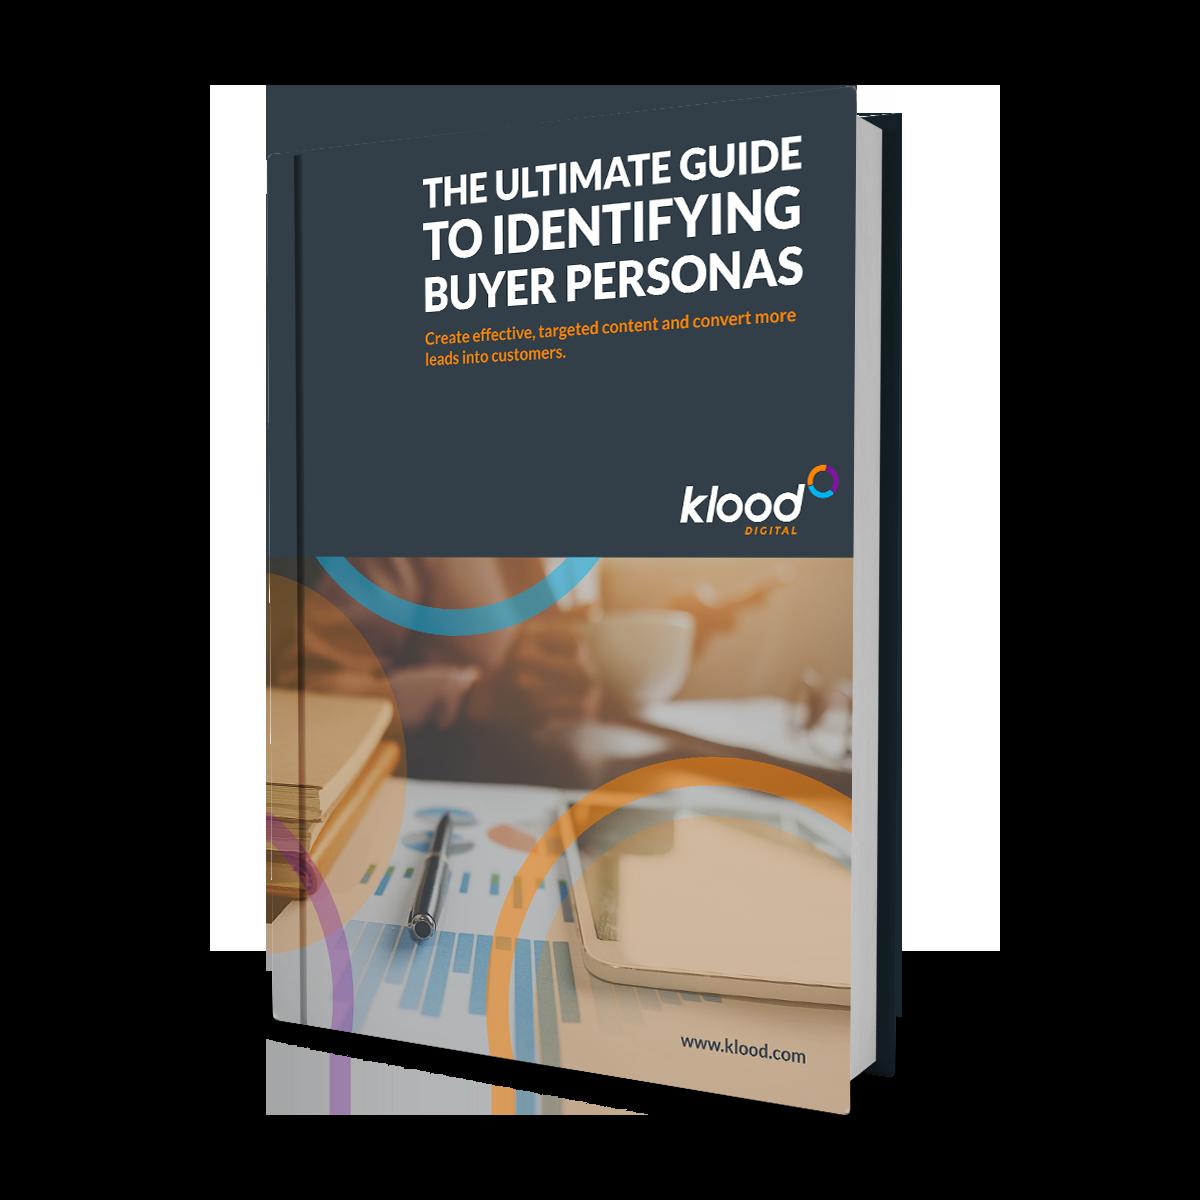 Guide to identifying buyer personas - free marketing resource